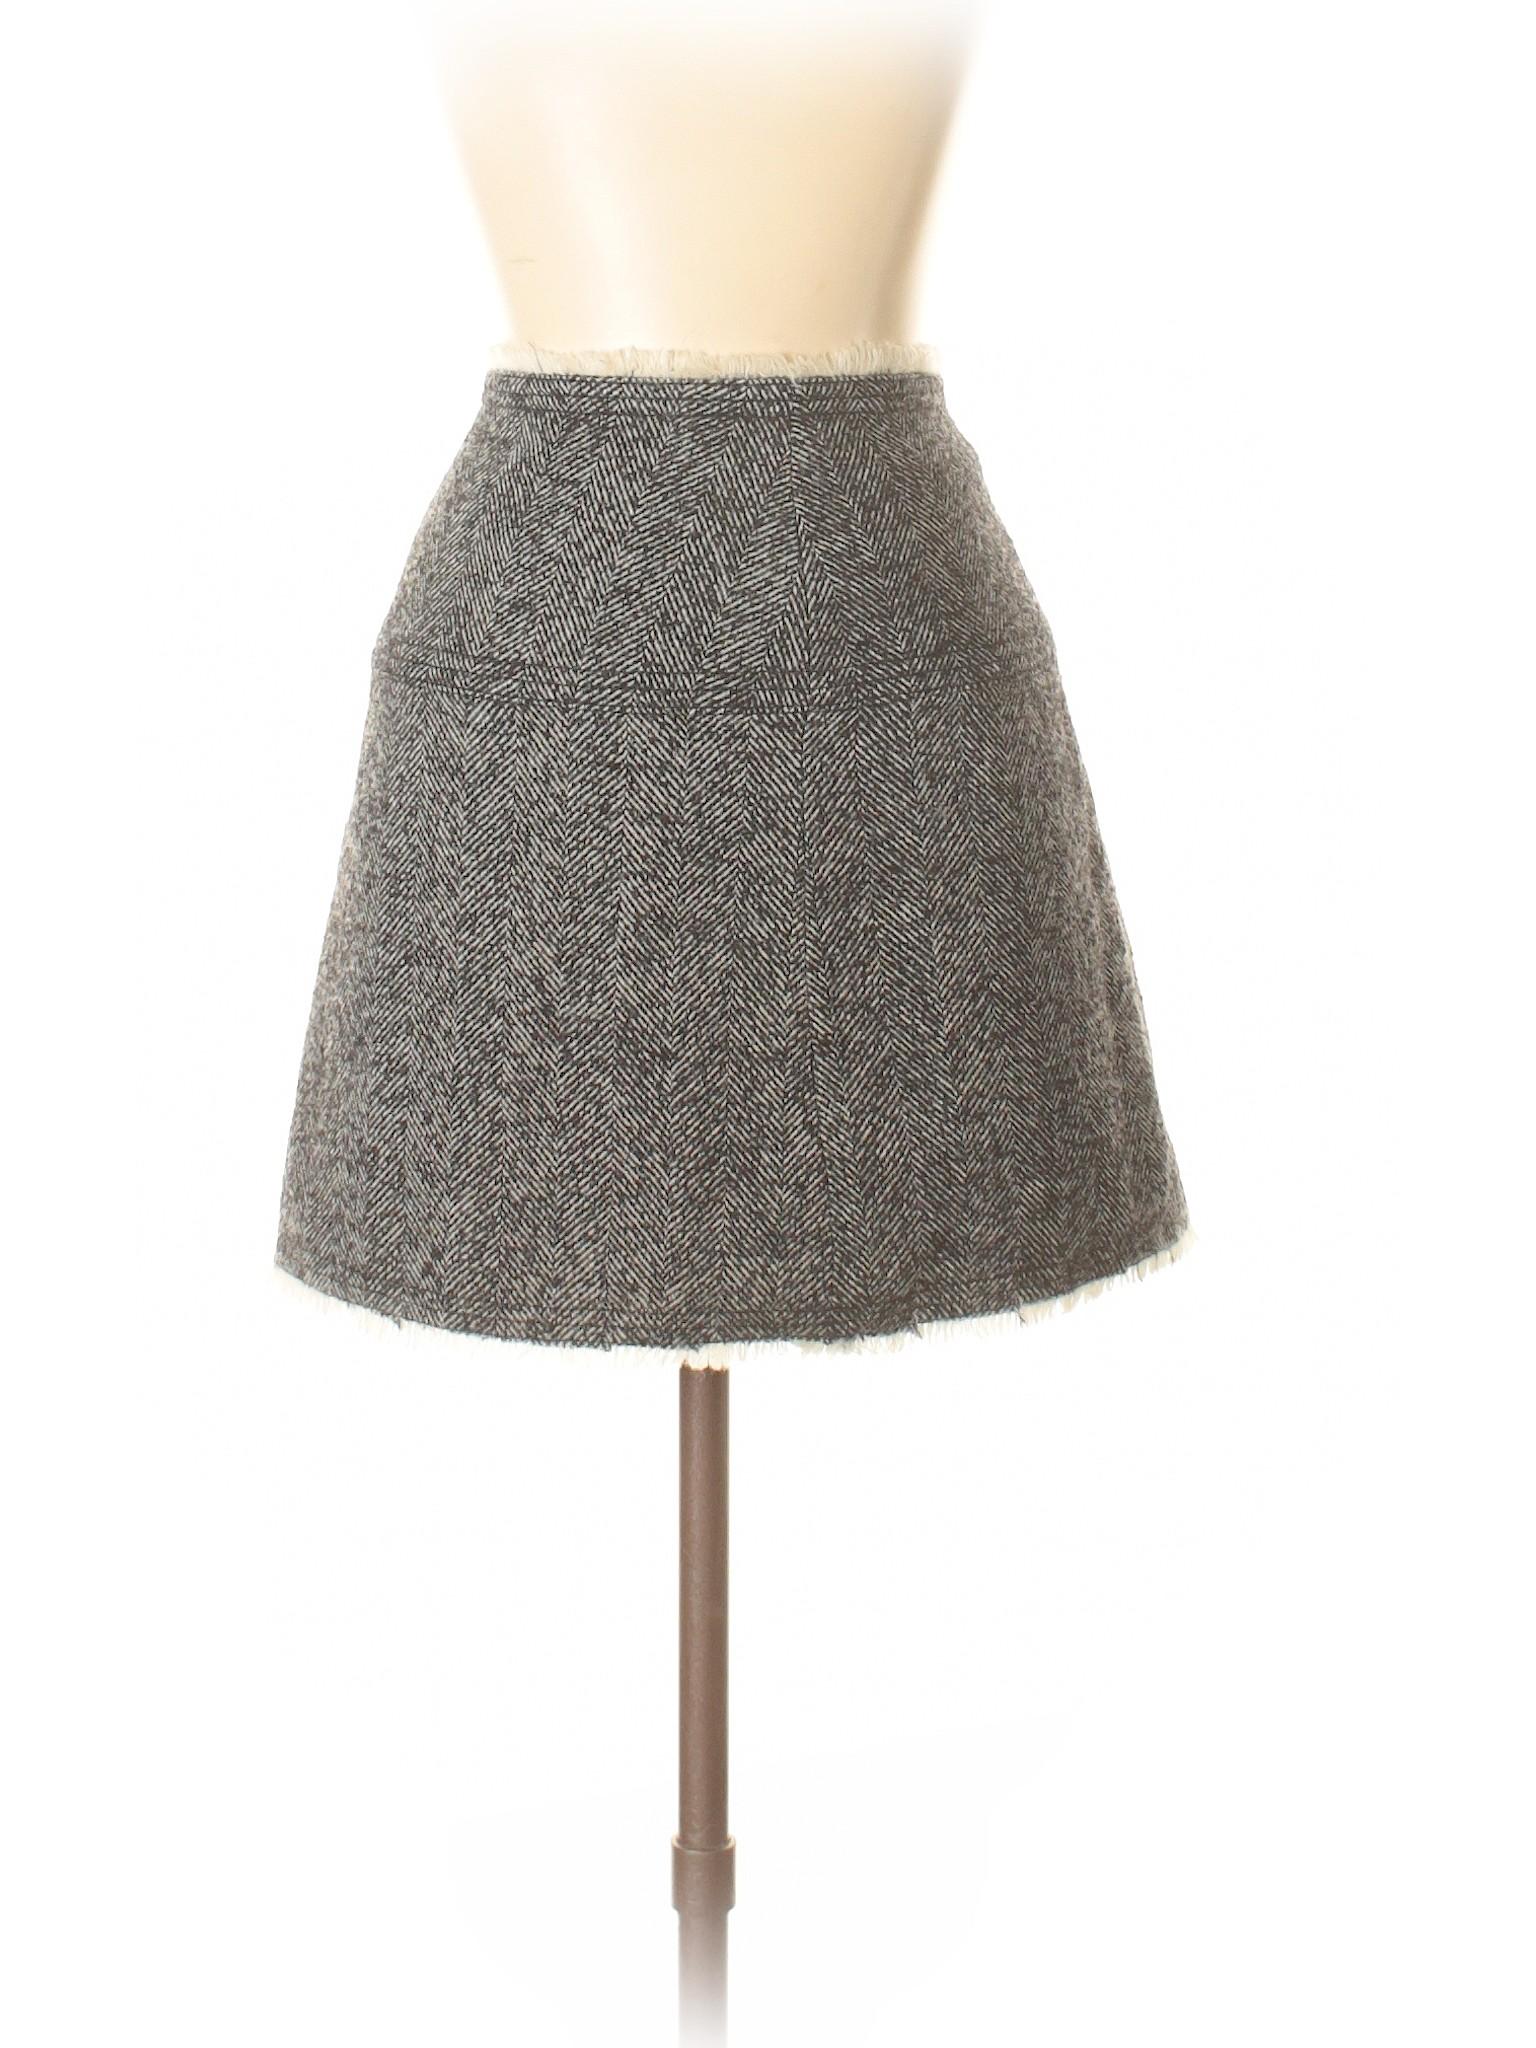 Crew Wool Skirt Wool Boutique Crew J J Boutique wwZ6Xqp